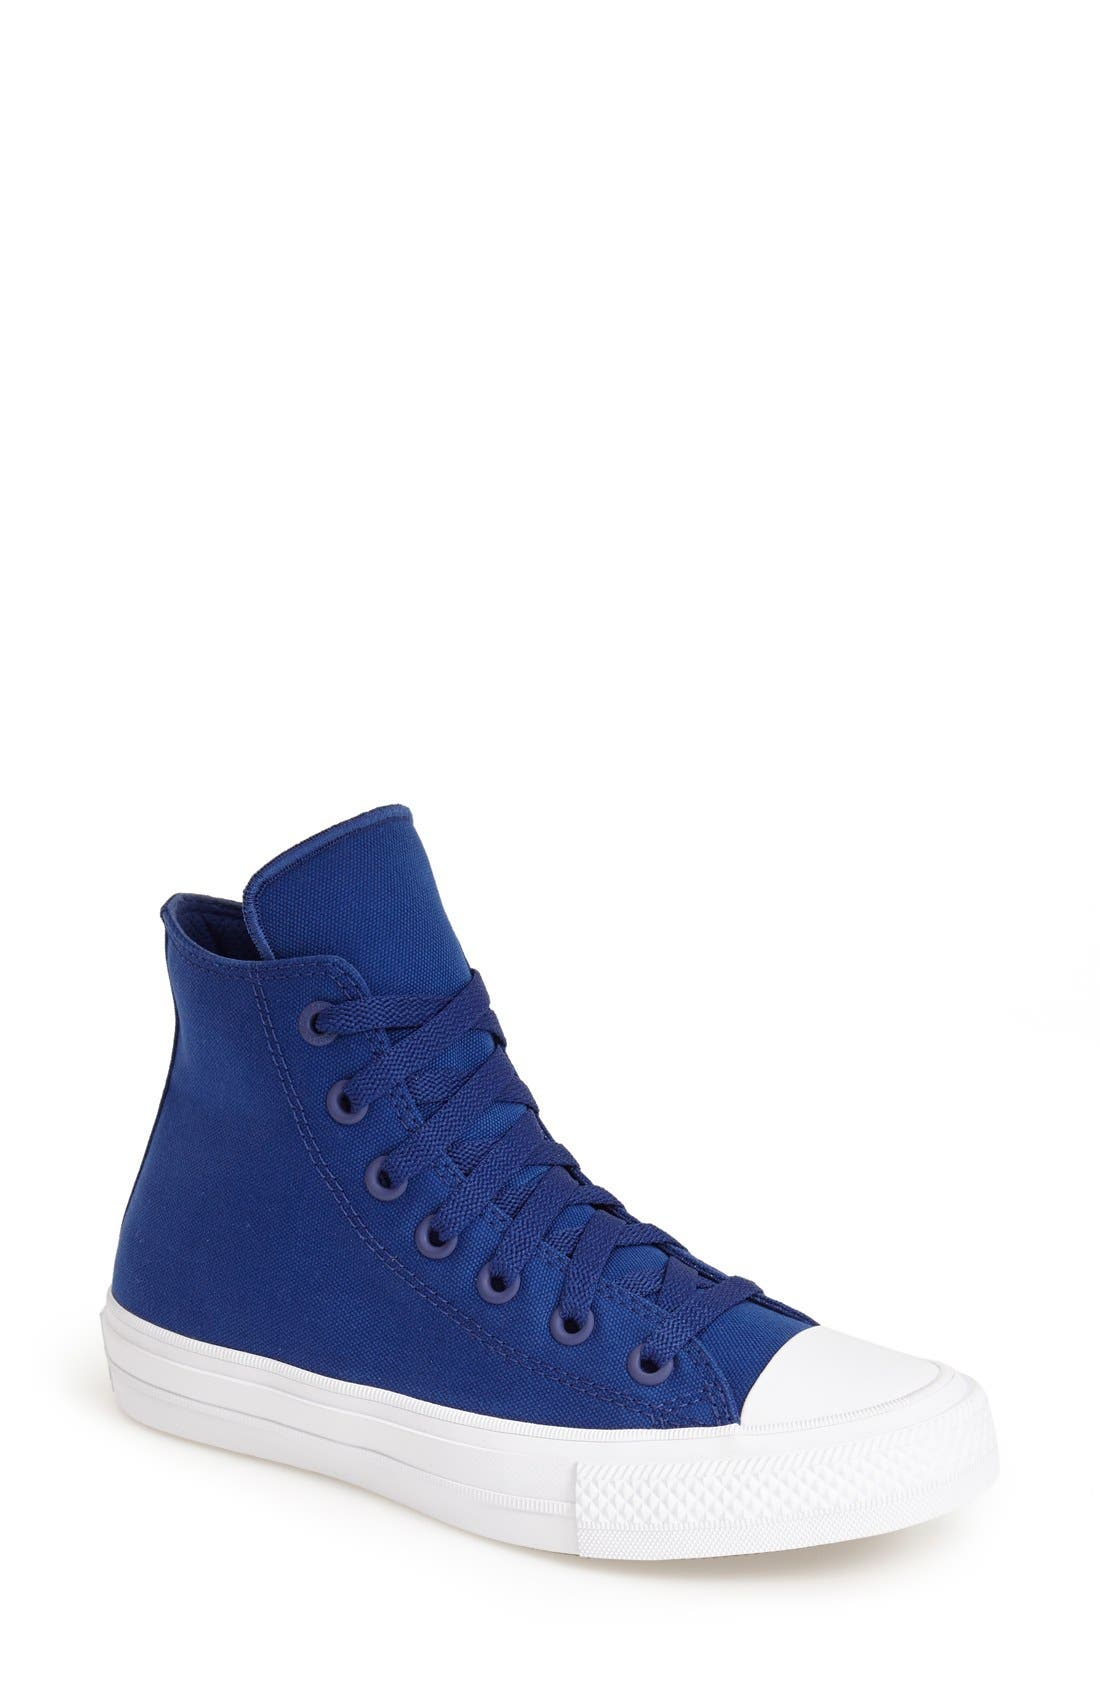 Main Image - Converse Chuck Taylor® All Star® 'Chuck II' High Top Sneaker (Women) (Regular Retail Price: $74.95)